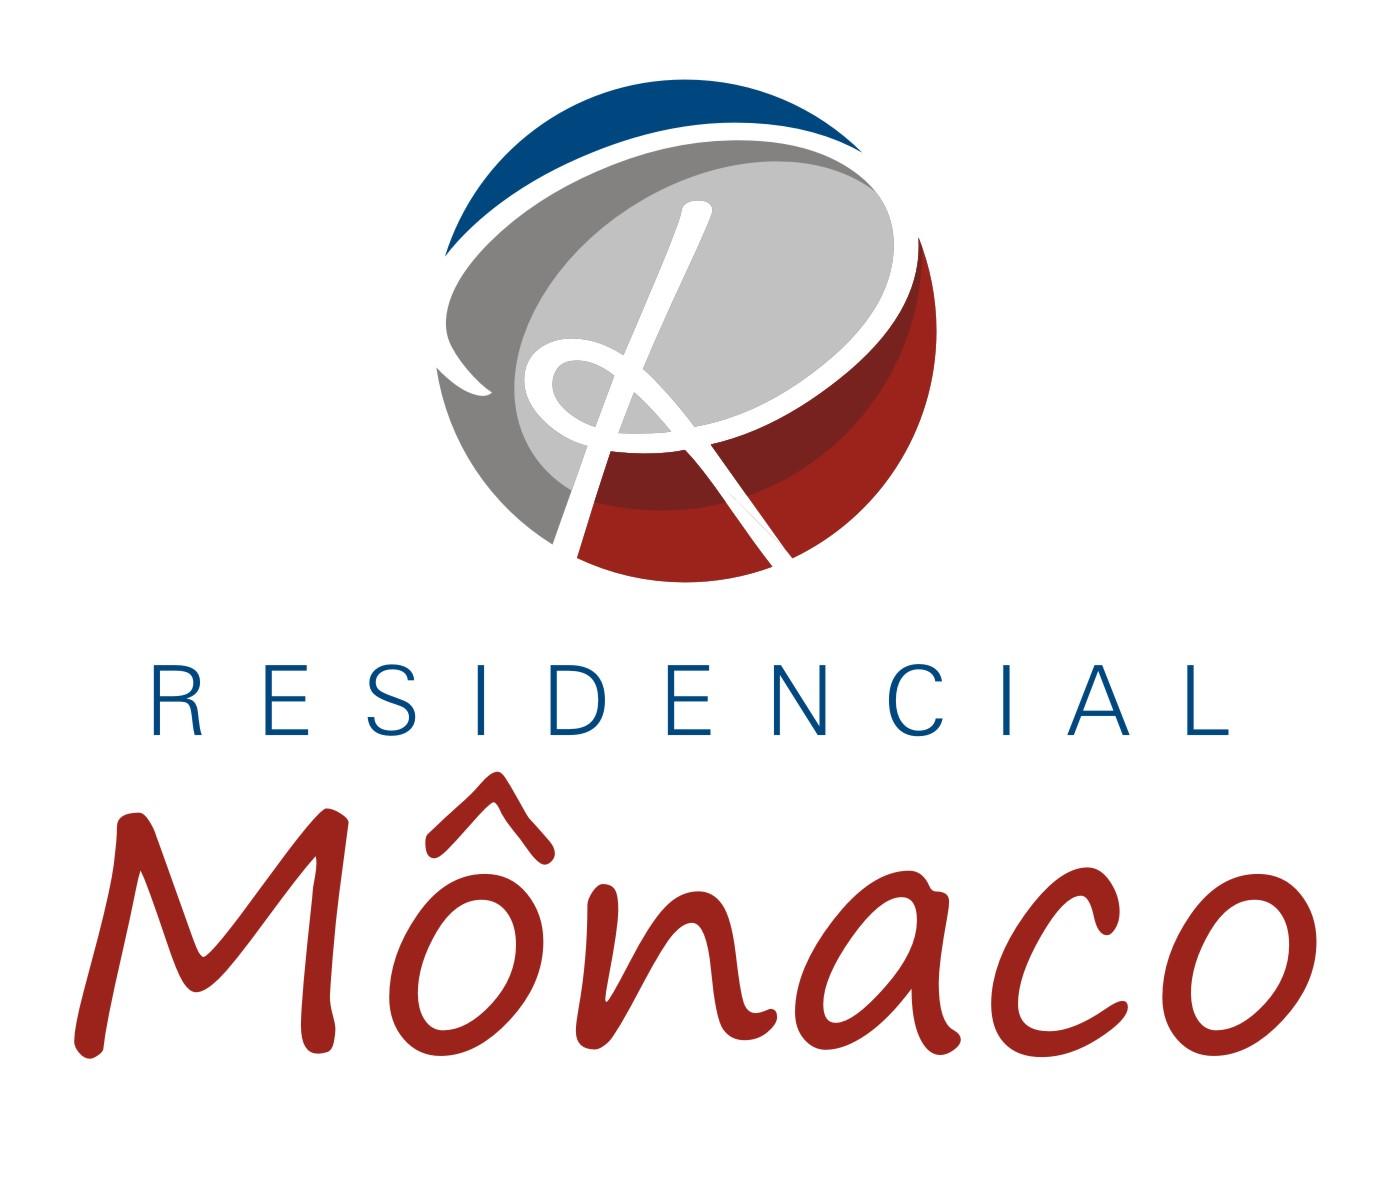 https://s3.amazonaws.com/dinder.com.br/wp-content/uploads/sites/521/2019/07/logo-M%C3%B4naco.jpg